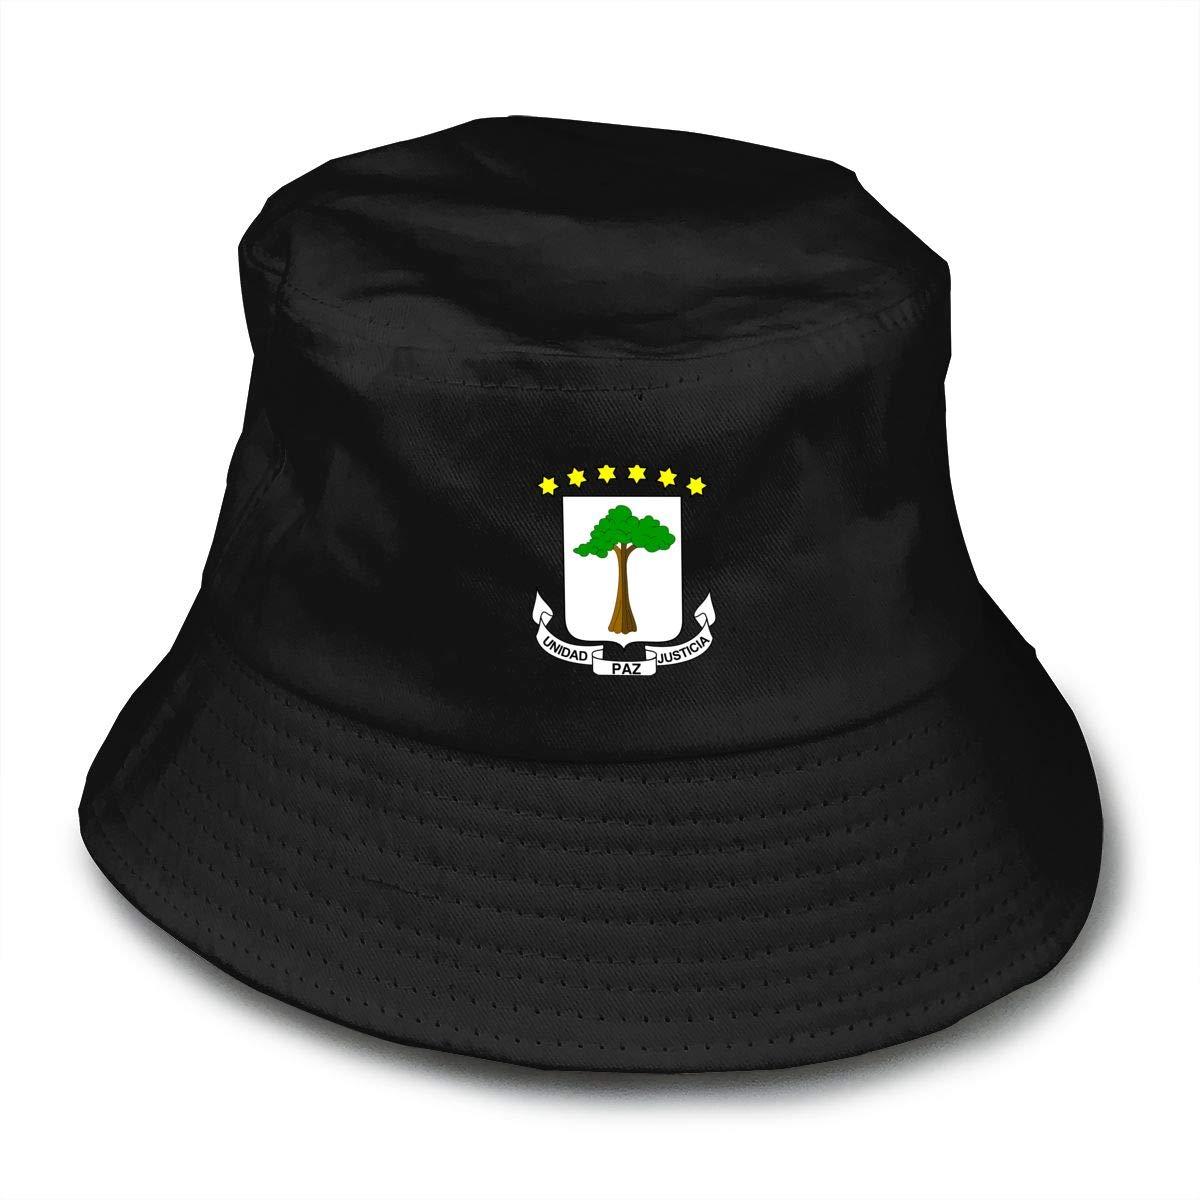 NDFGR Coat of Arms Equatorial Guinea Flag Unisex Cotton Packable Black Travel Bucket Hat Fishing Cap